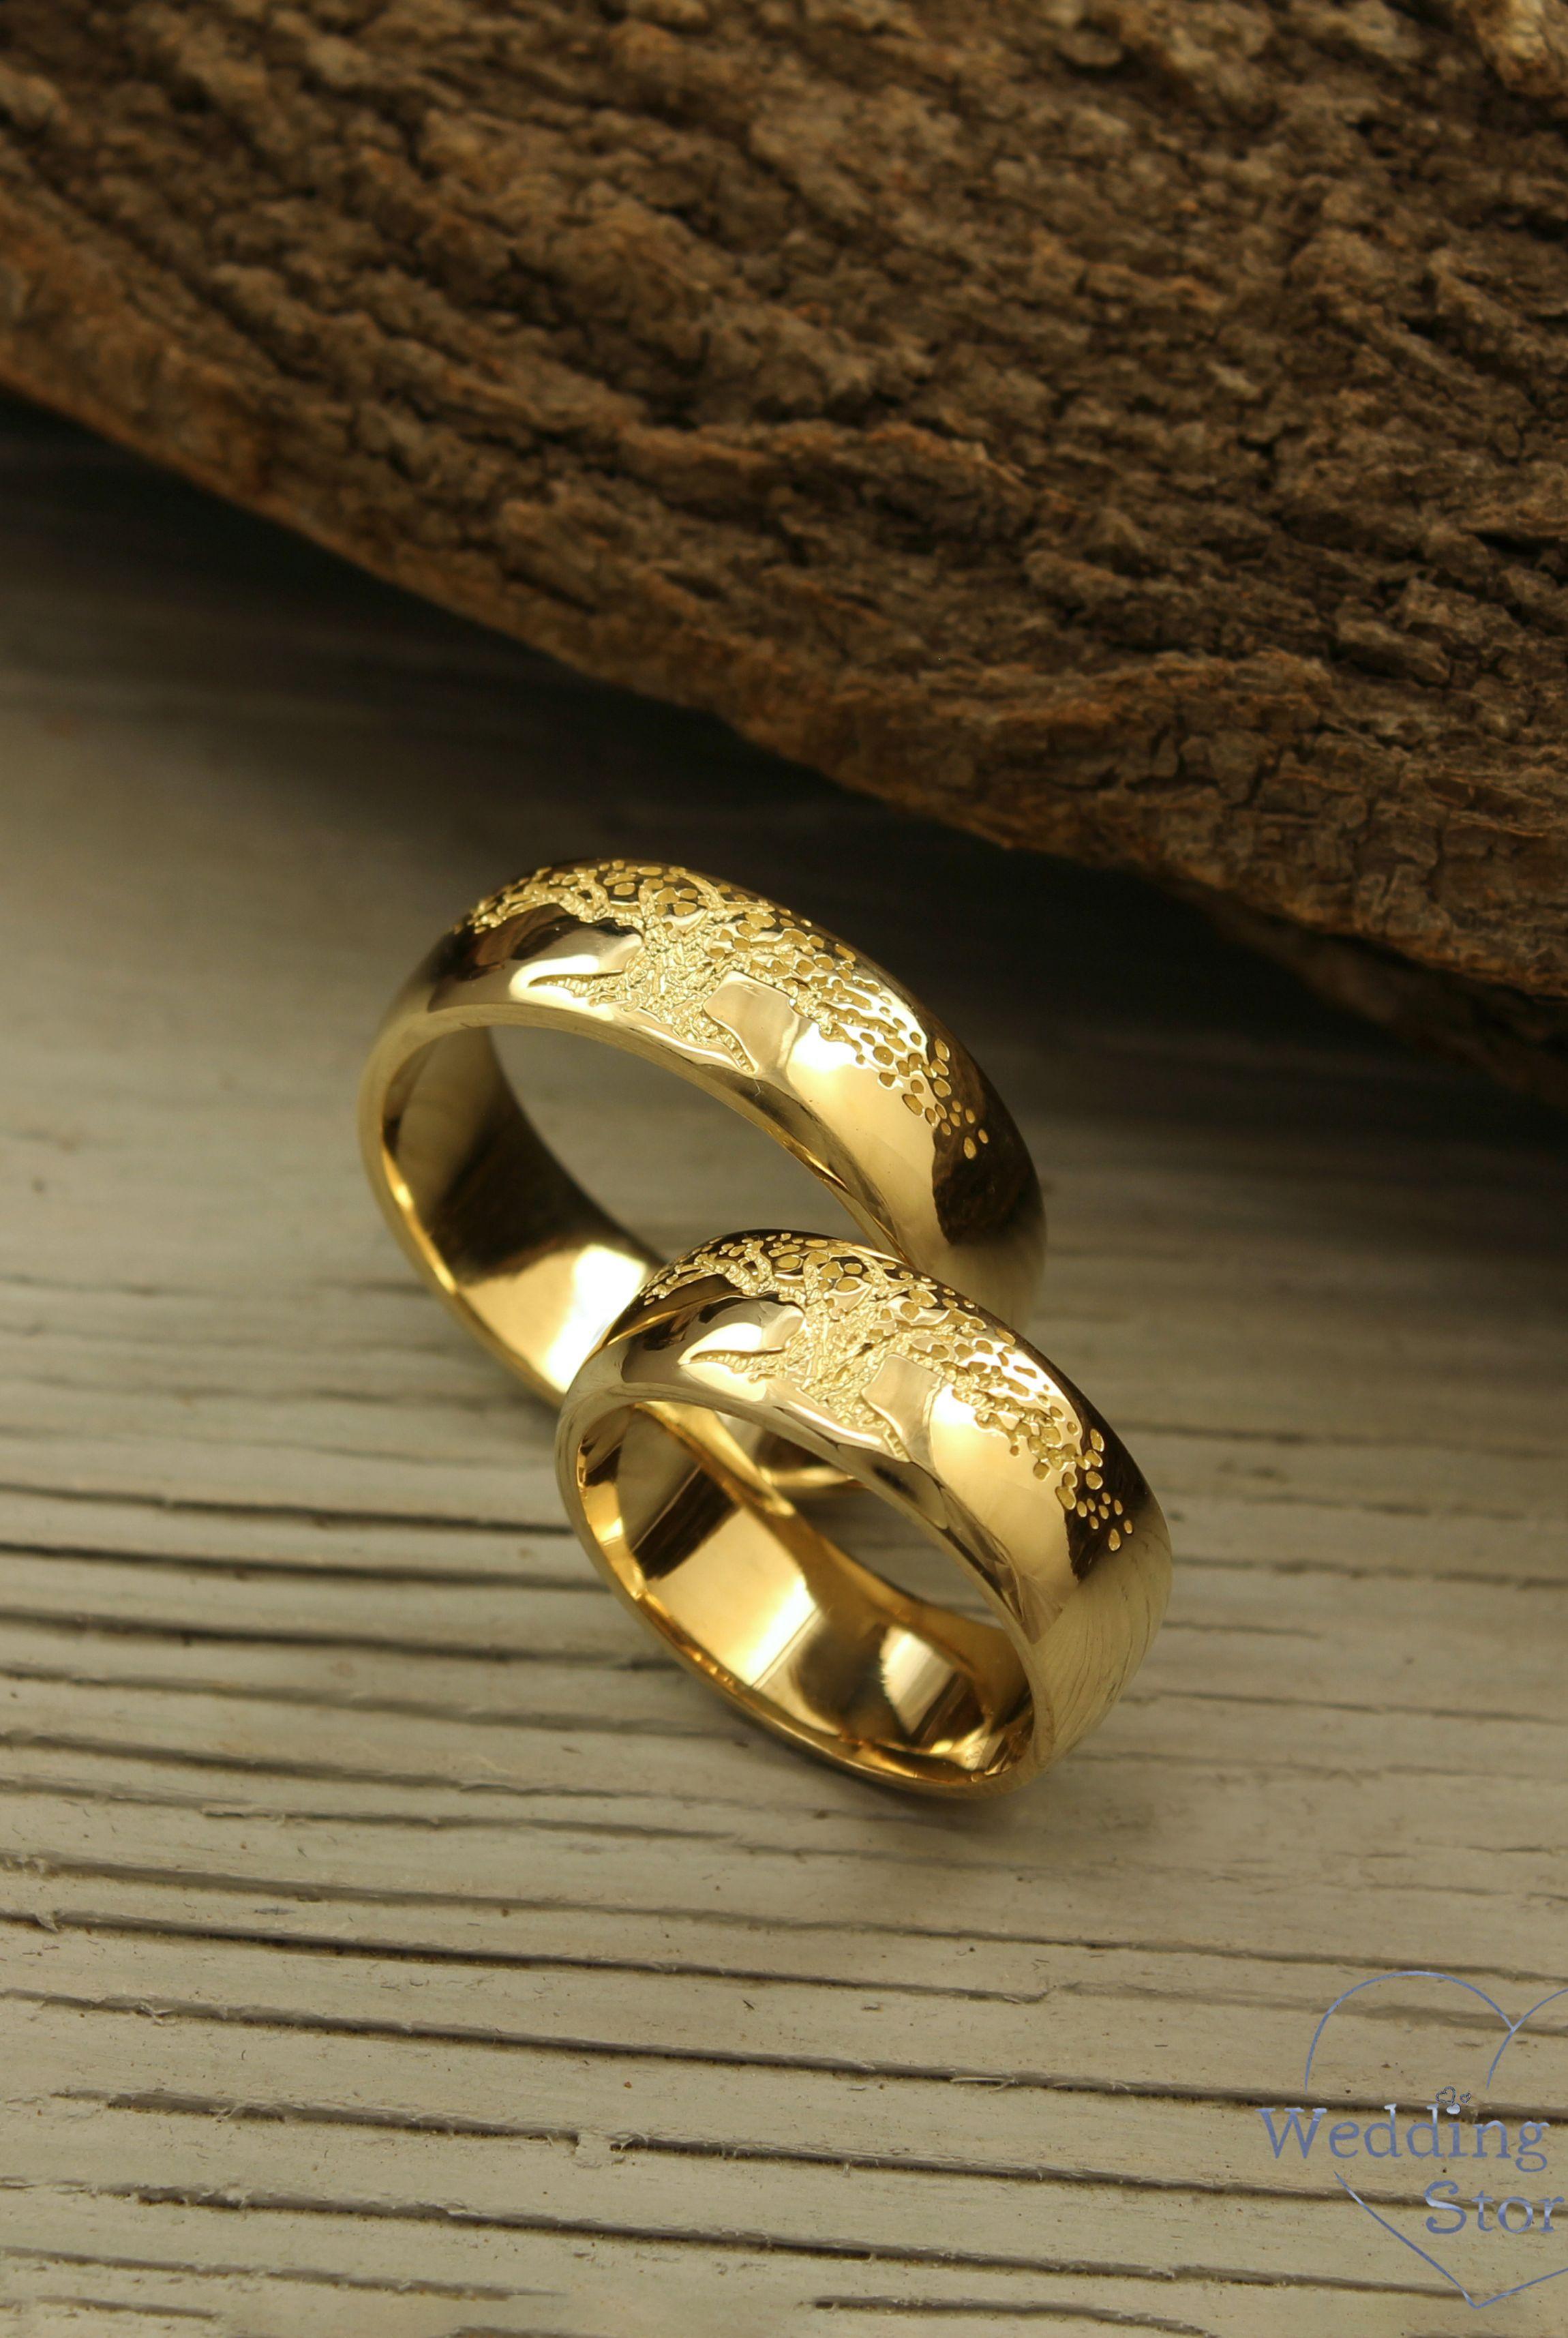 Tree Of Life Wedding Bands Set Family Tree Wedding Rings Etsy In 2020 Wedding Band Sets Wedding Rings Etsy Wedding Rings